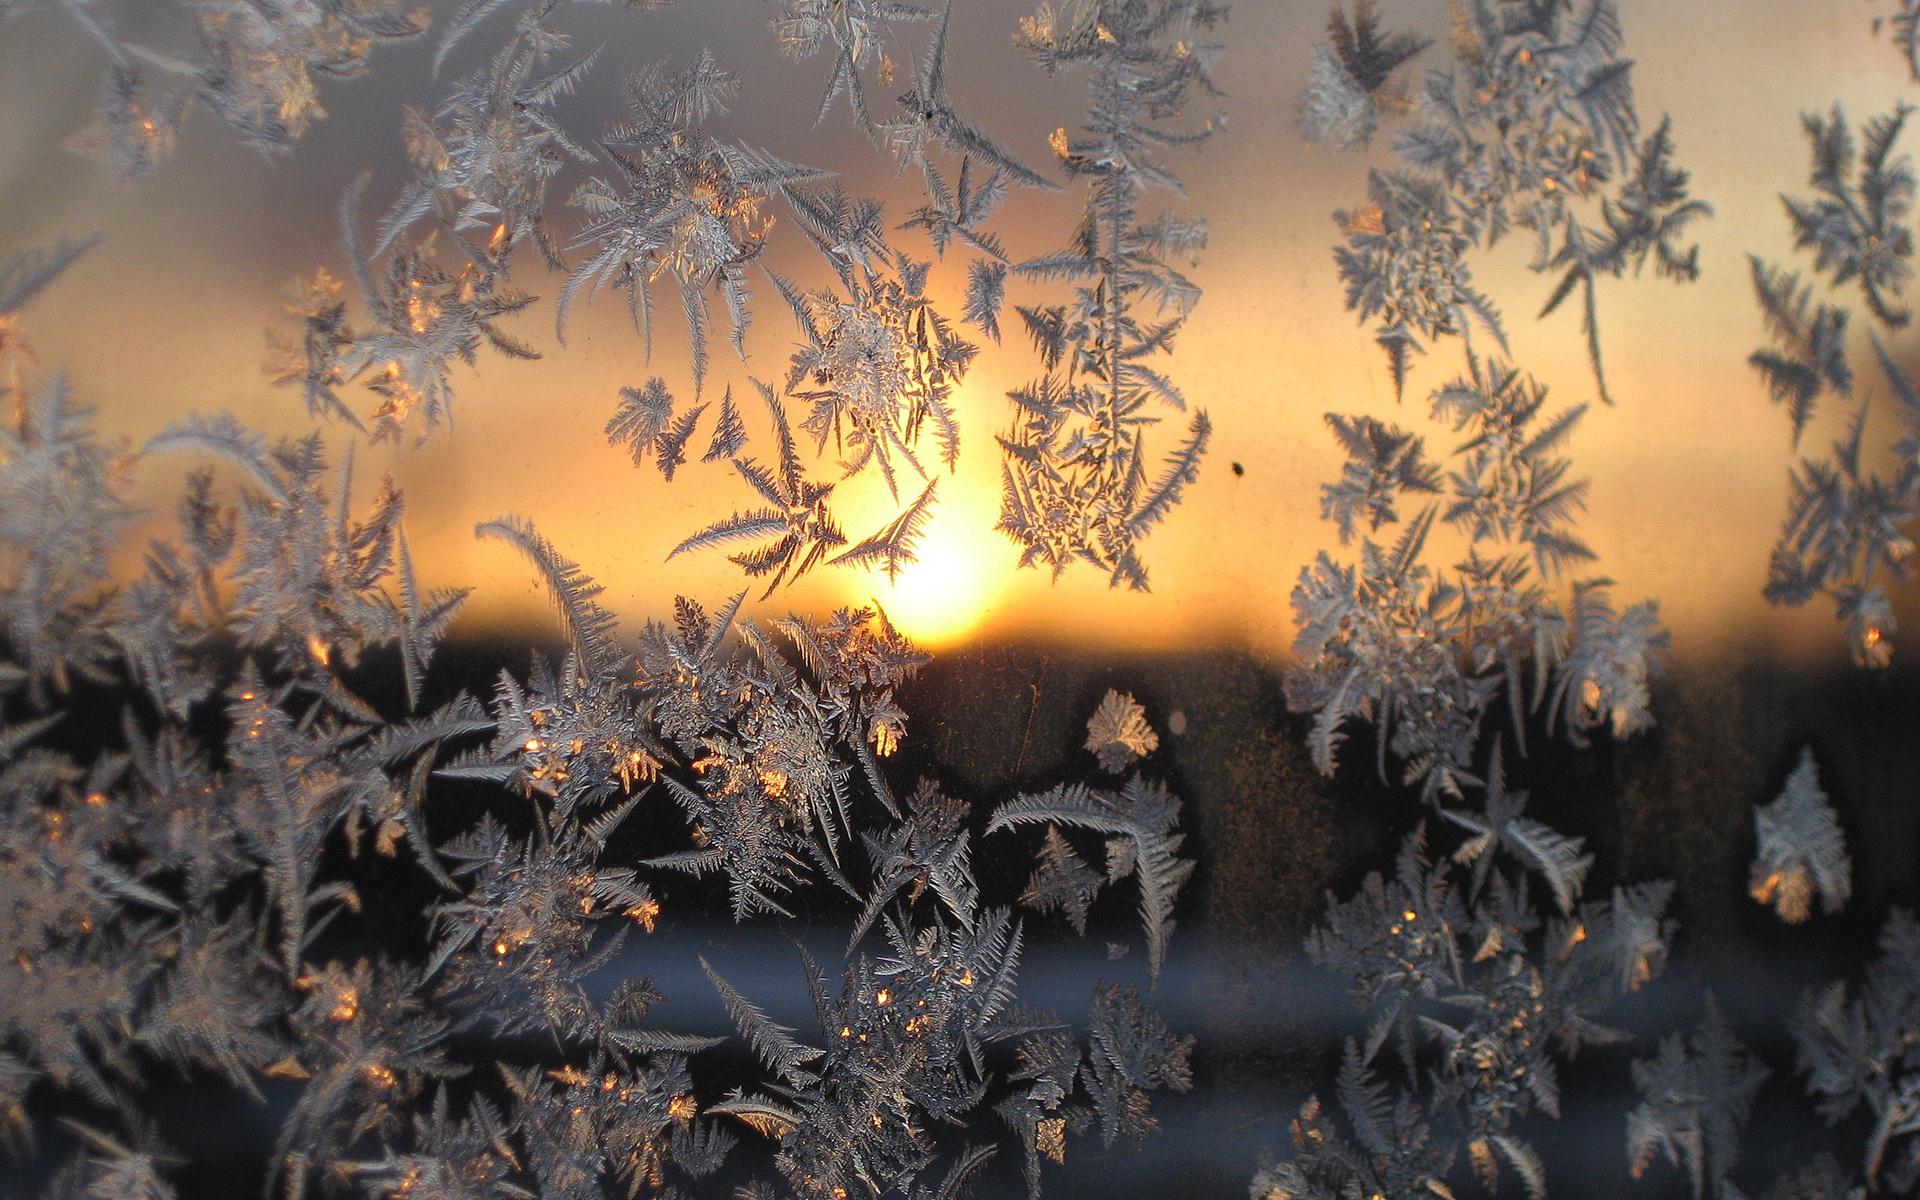 17244 скачать обои Зима, Закат, Фон, Лед - заставки и картинки бесплатно